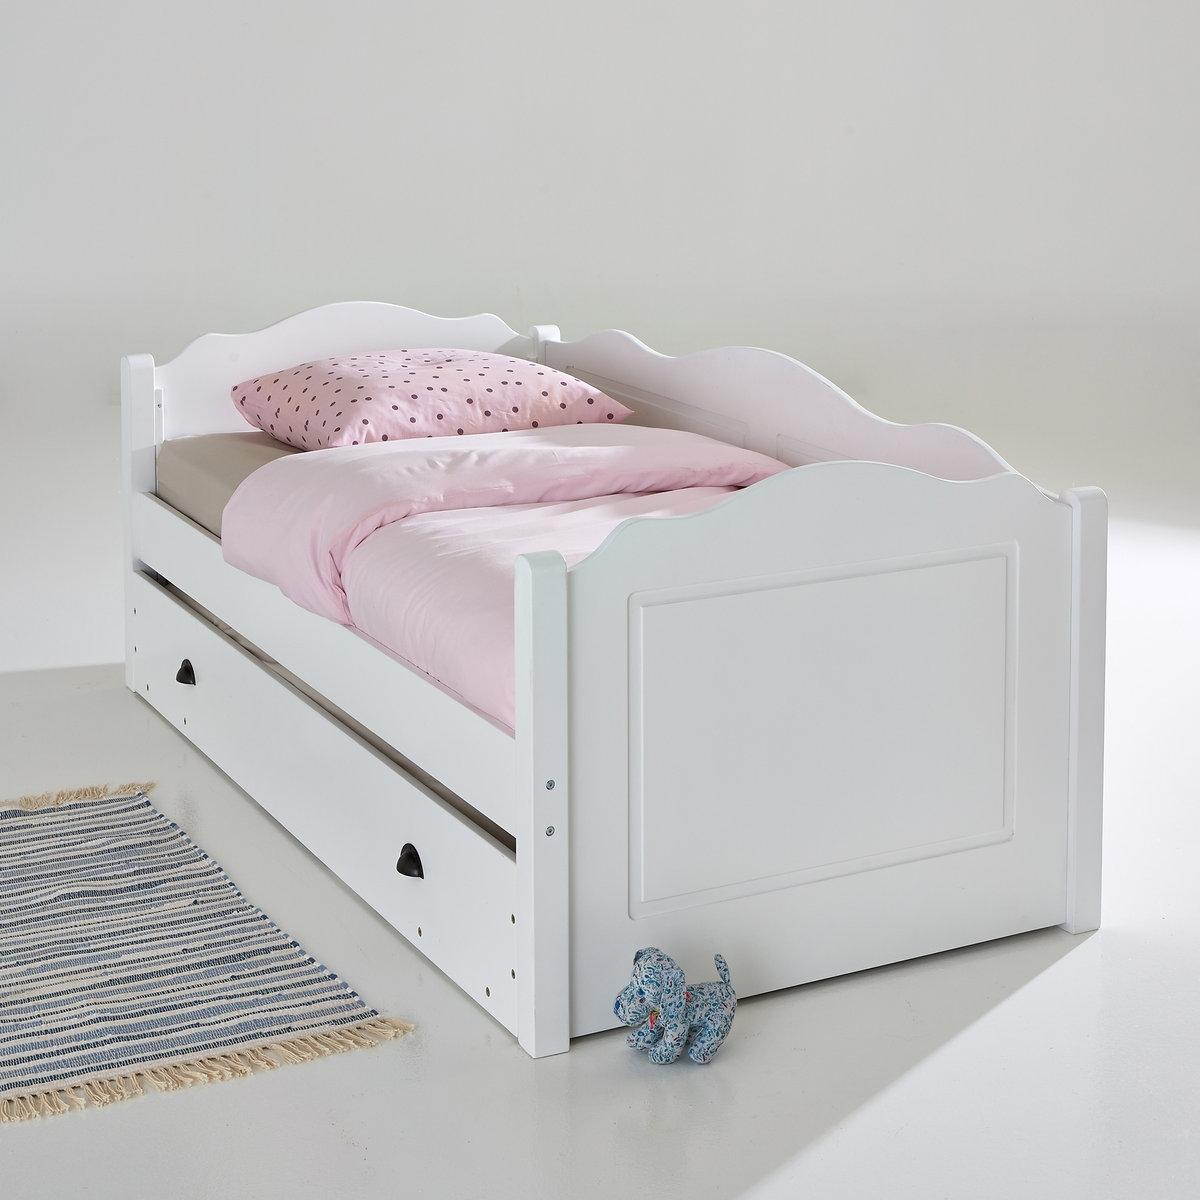 Кровать La Redoute Раздвижная -позиционная Authentic Style 90 x 190 см белый x style